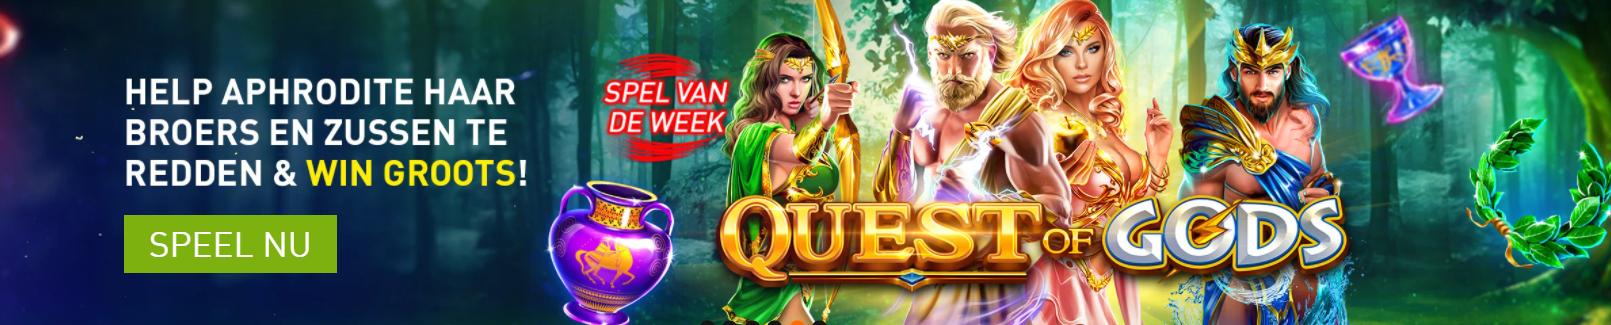 Quest of God online Casino speelhal nieuwe slots Goden Casino 777 Circus Supergame 2021